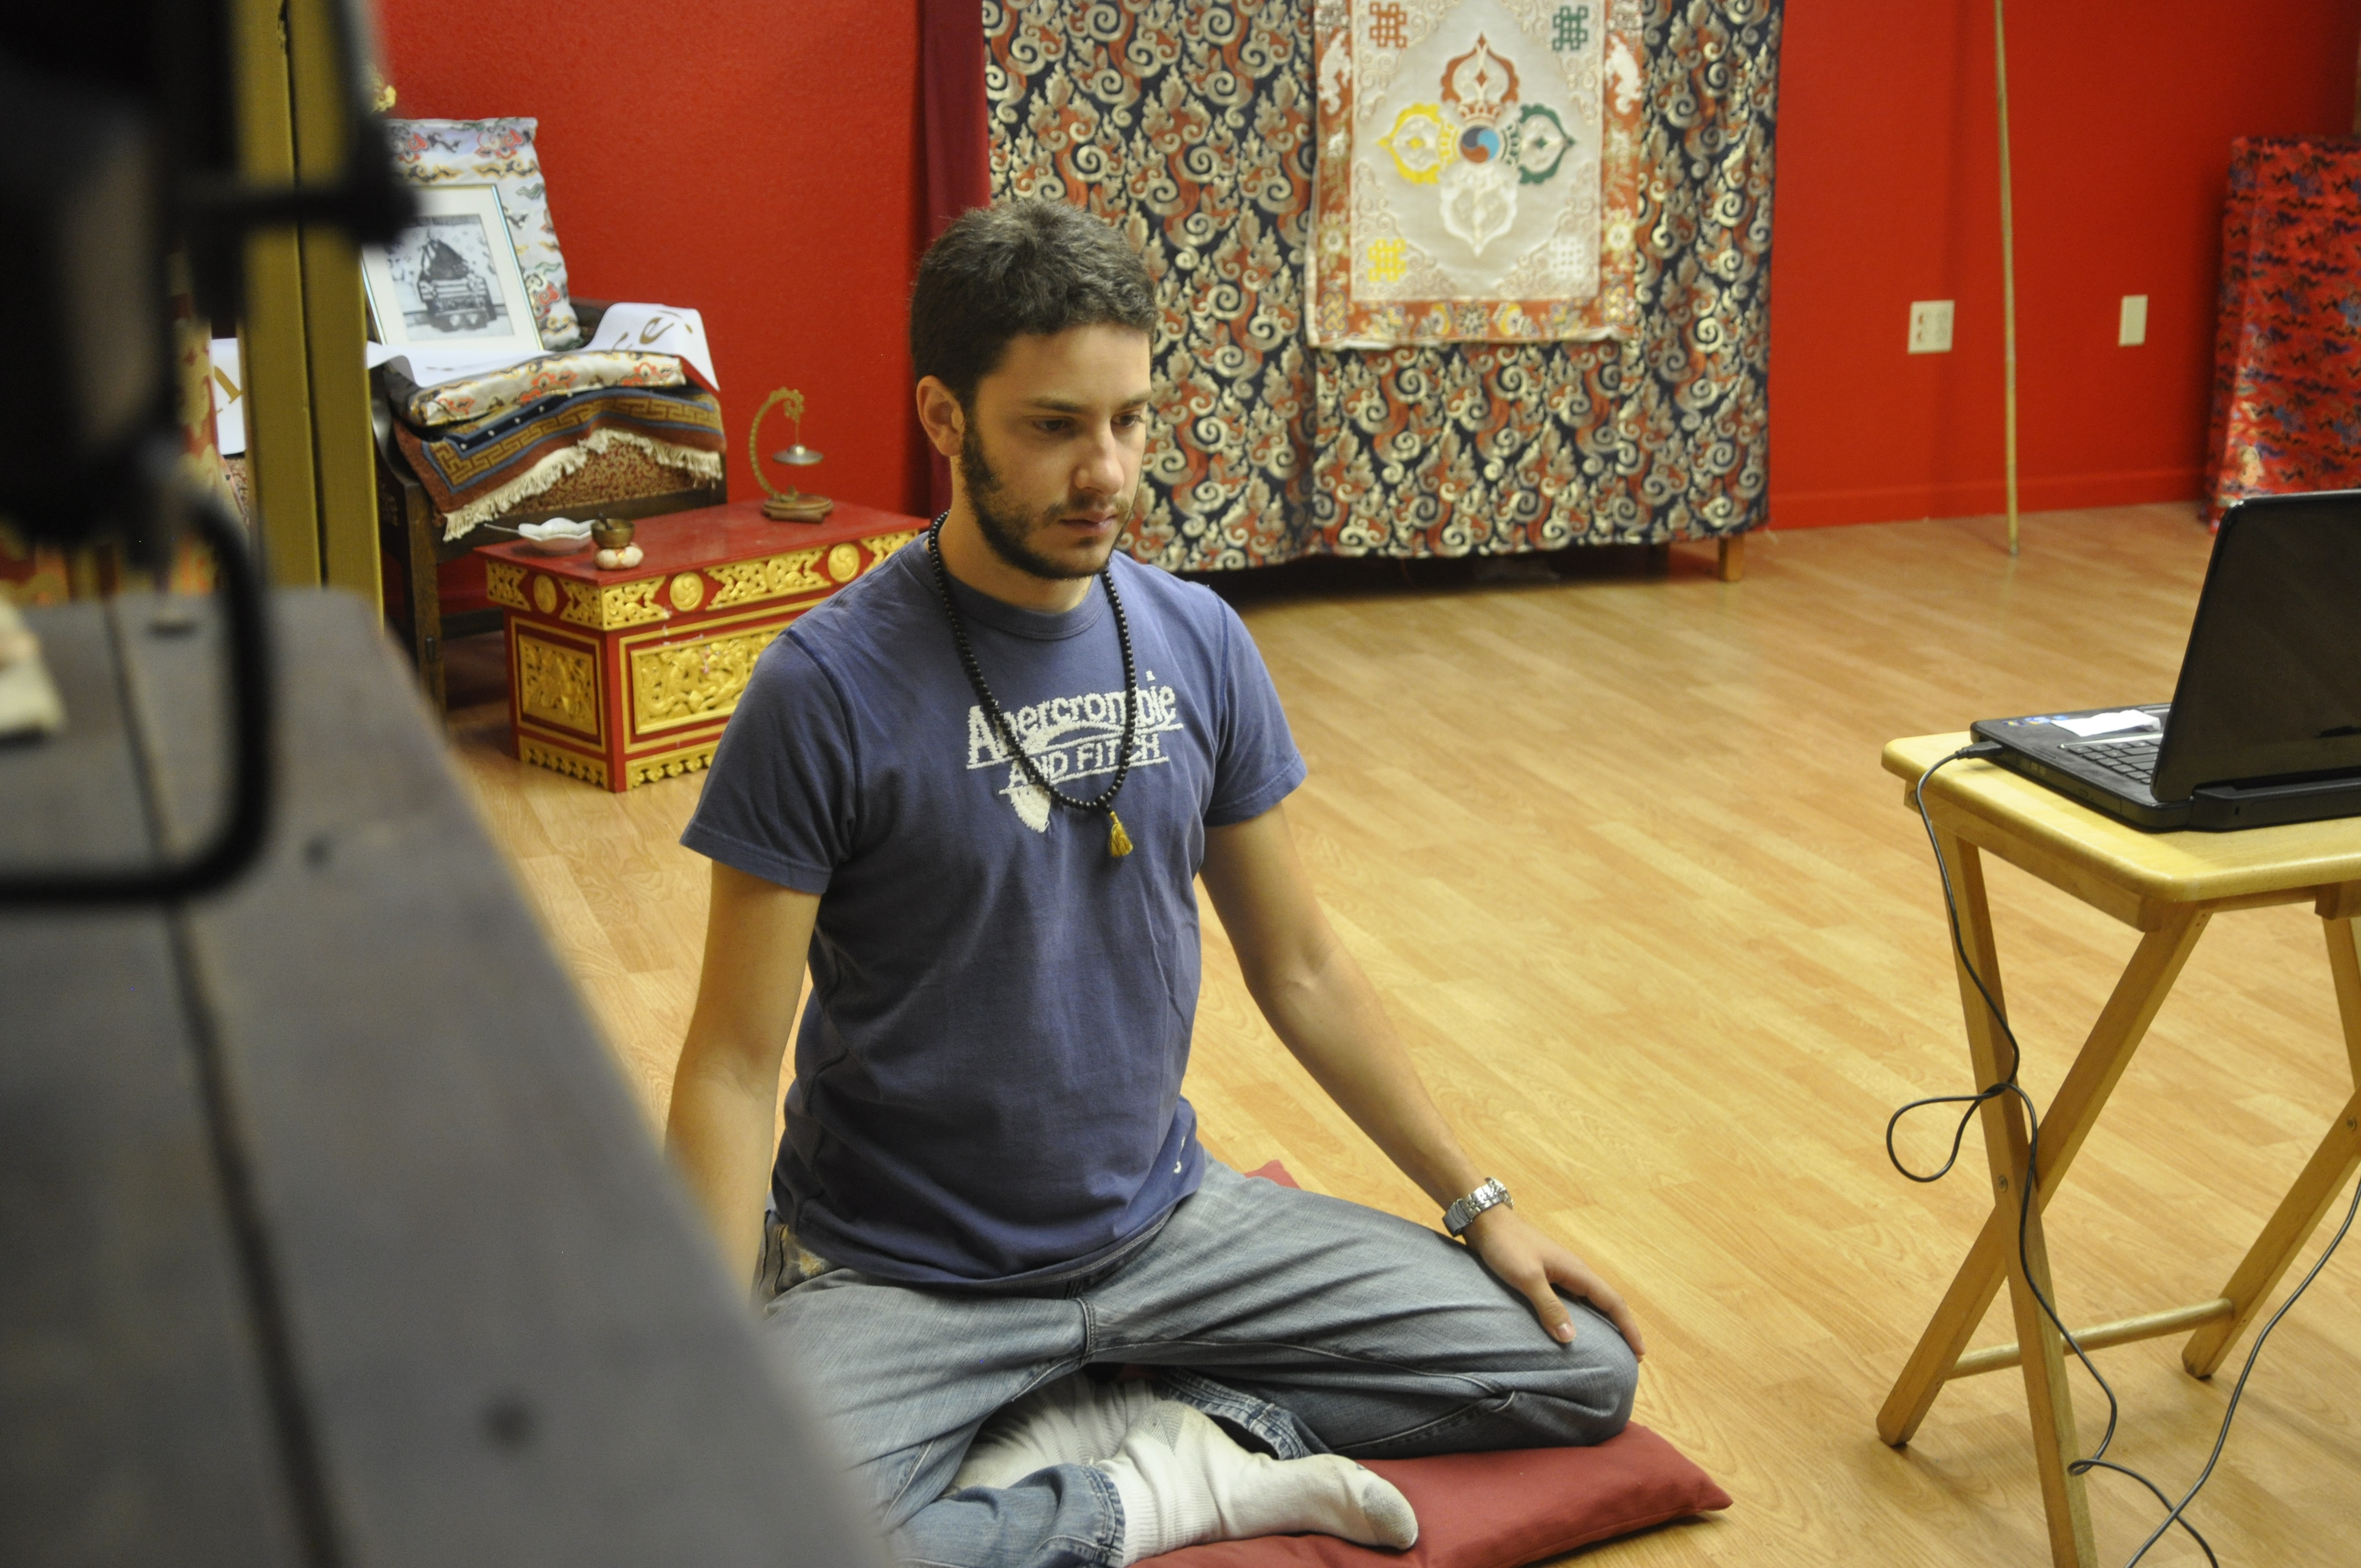 Buddhism 101 - 10 weeks